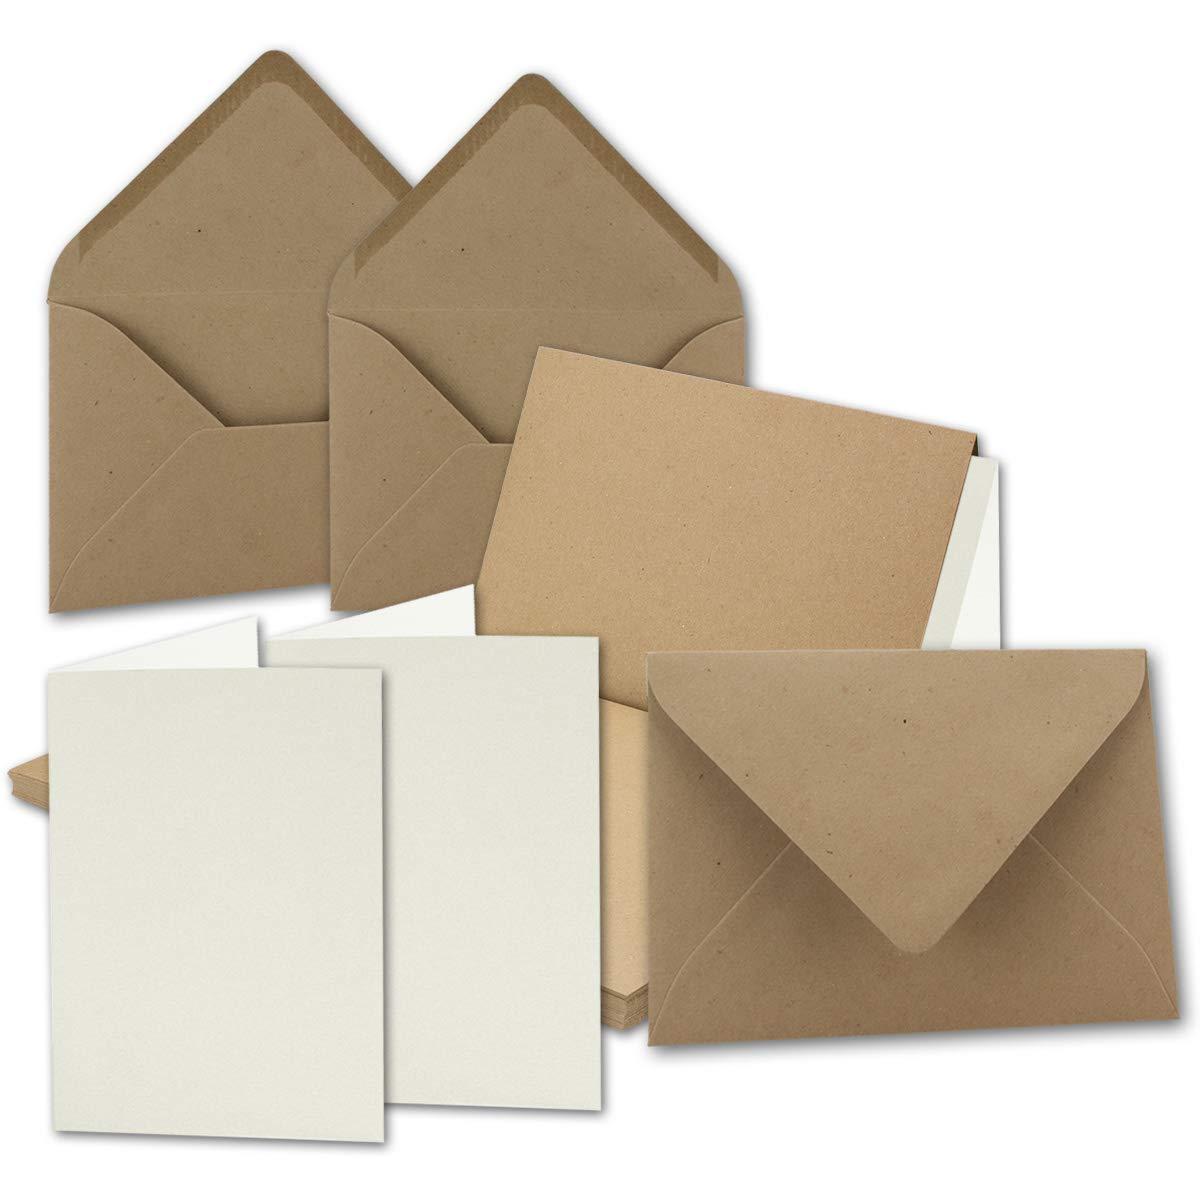 Set di carta da lettere e buste in carta kraft, formato DIN A5, colore sabbia, cartoncini doppi e buste C5 in carta riciclata, stampabili, serie UmWelt 10 Sets DIN A5 mit Umschlag NEUSER